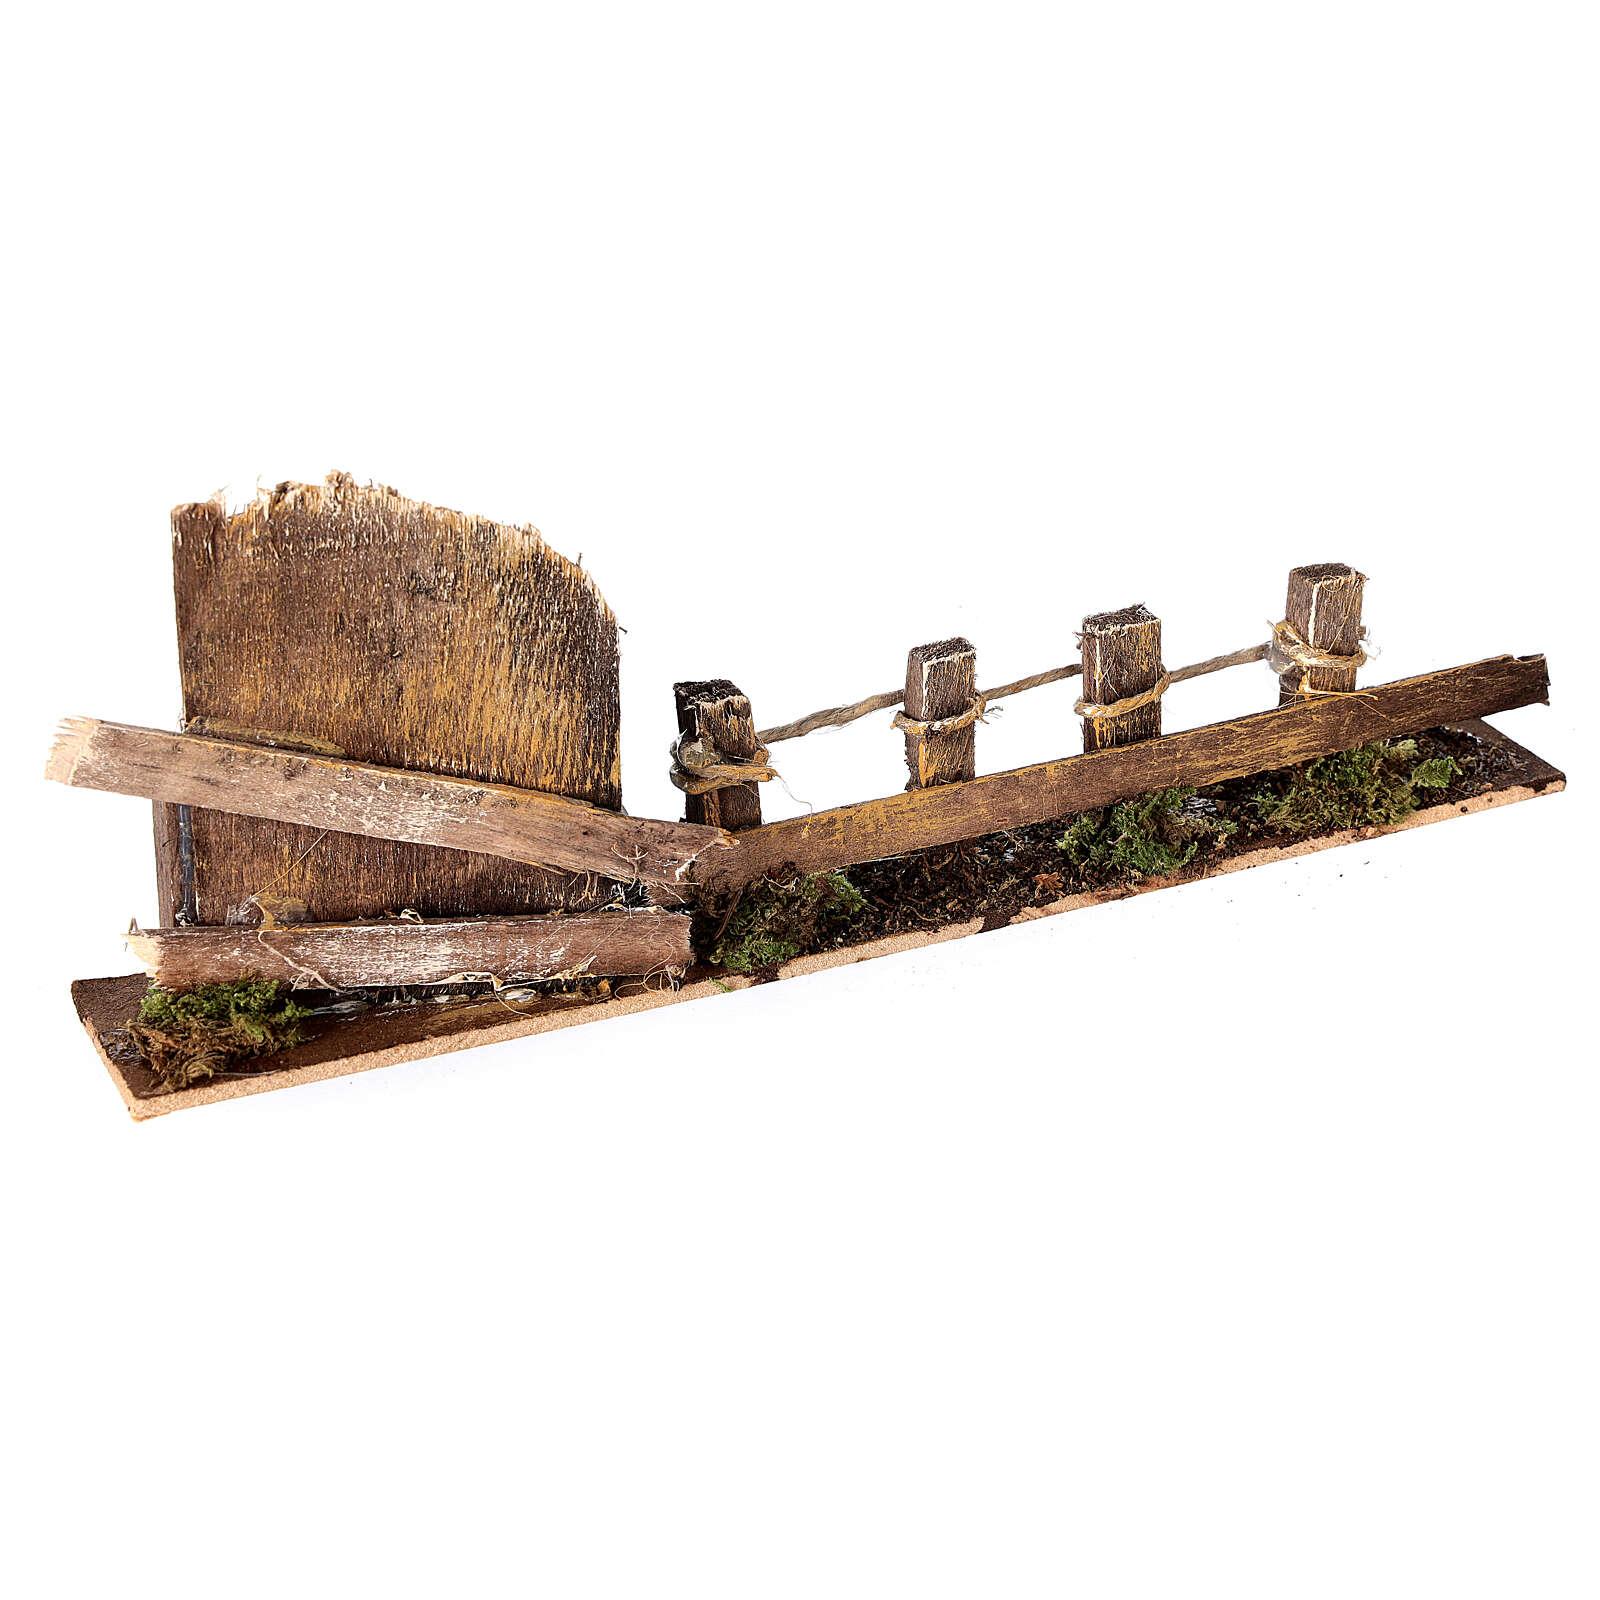 Cerca de madera con cancela de madera 10x25x5 cm belén 10-12 cm 4